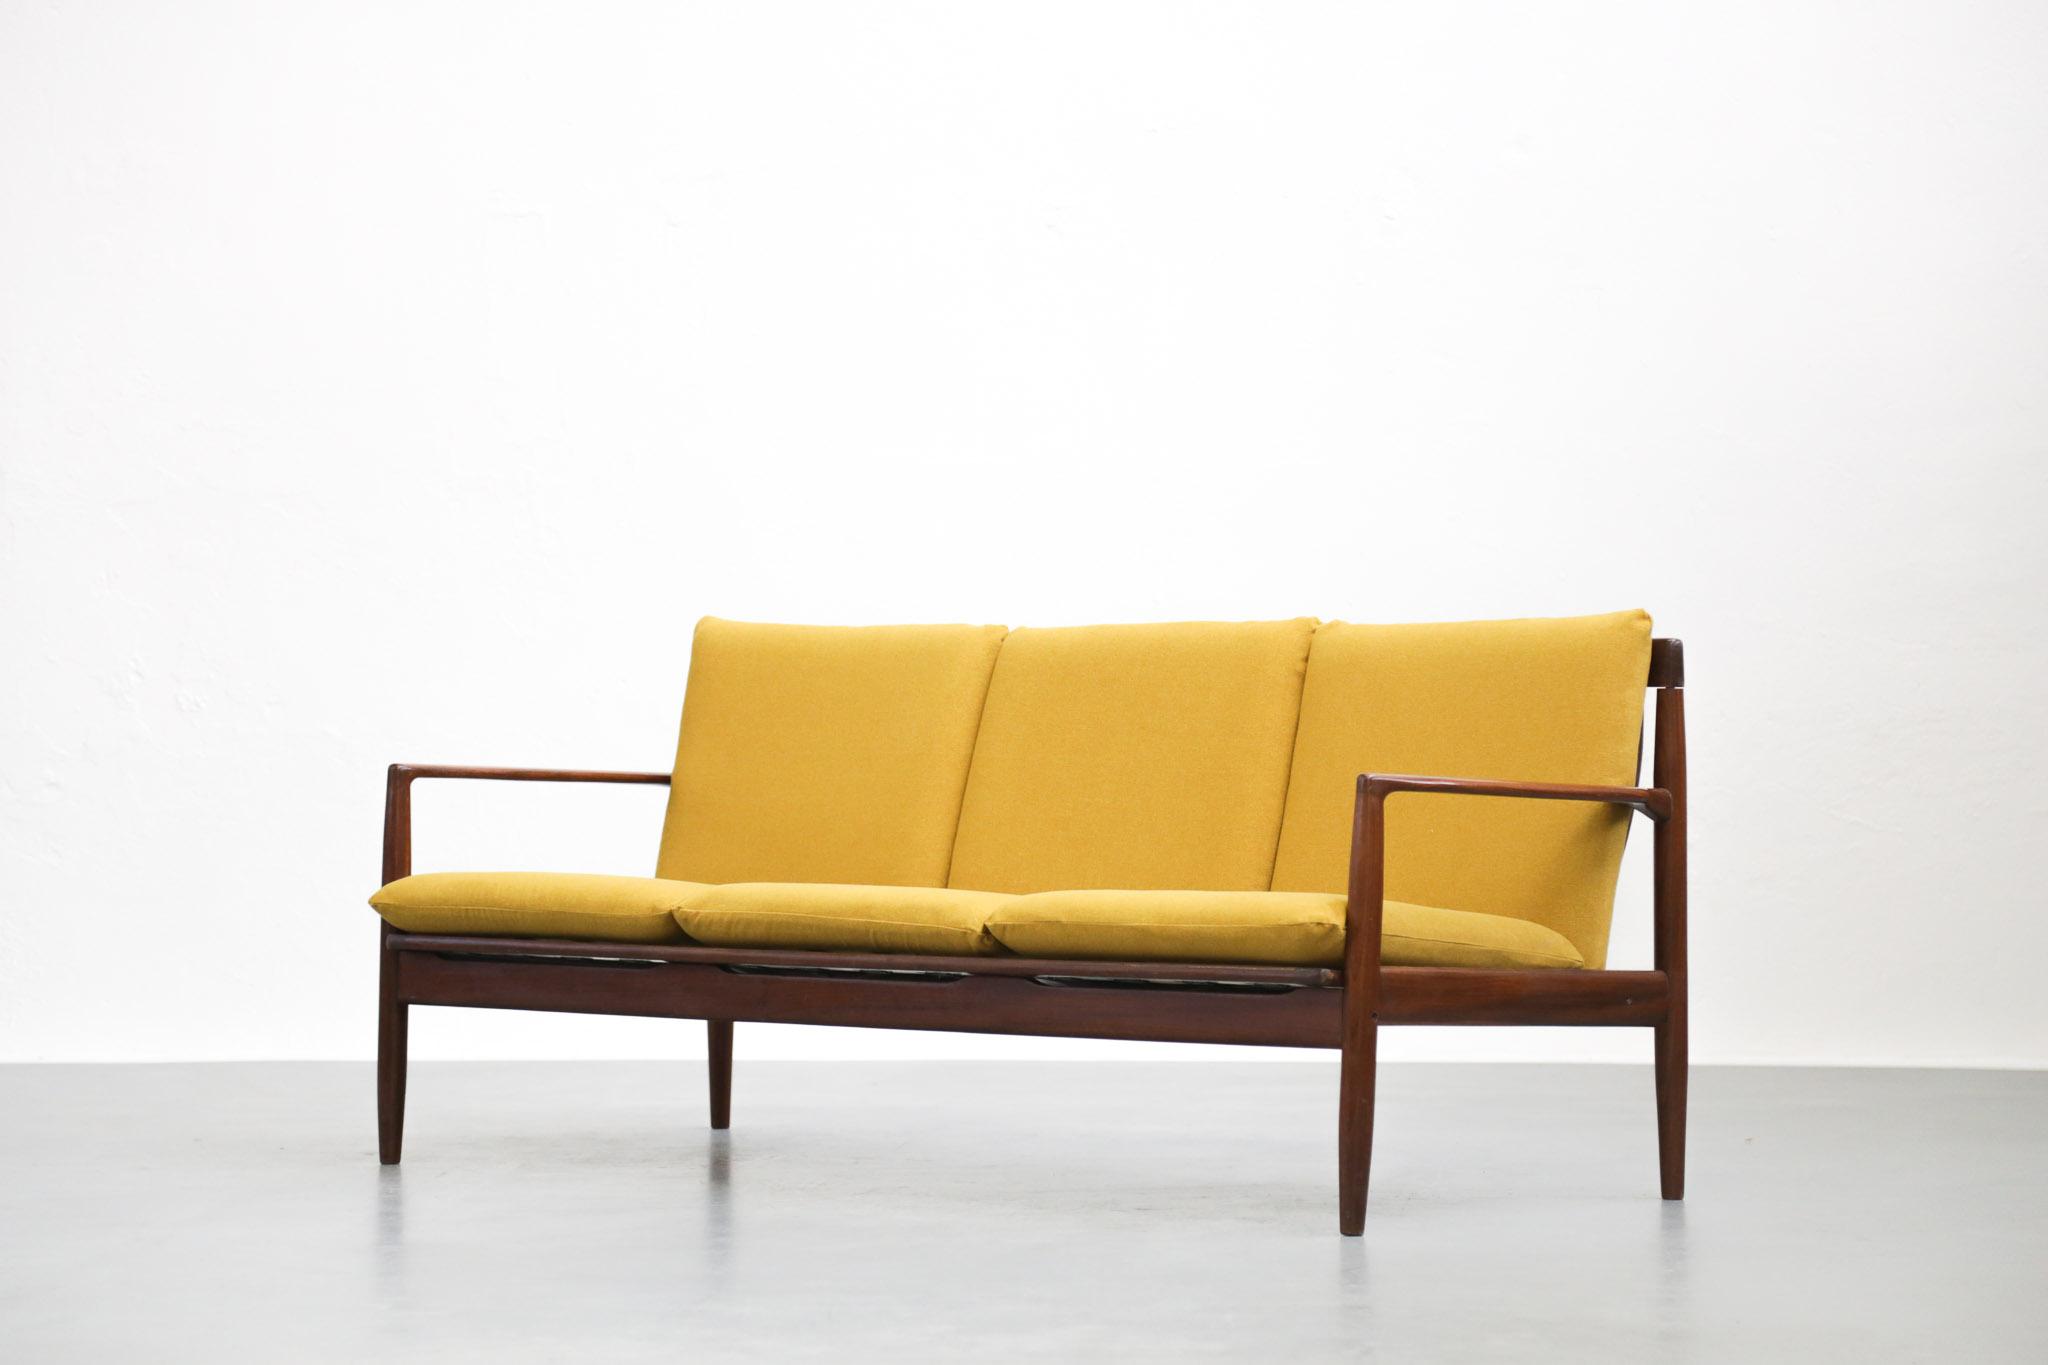 Banquette Scandinave Sofa Style Grete Jalk Teck Jaune